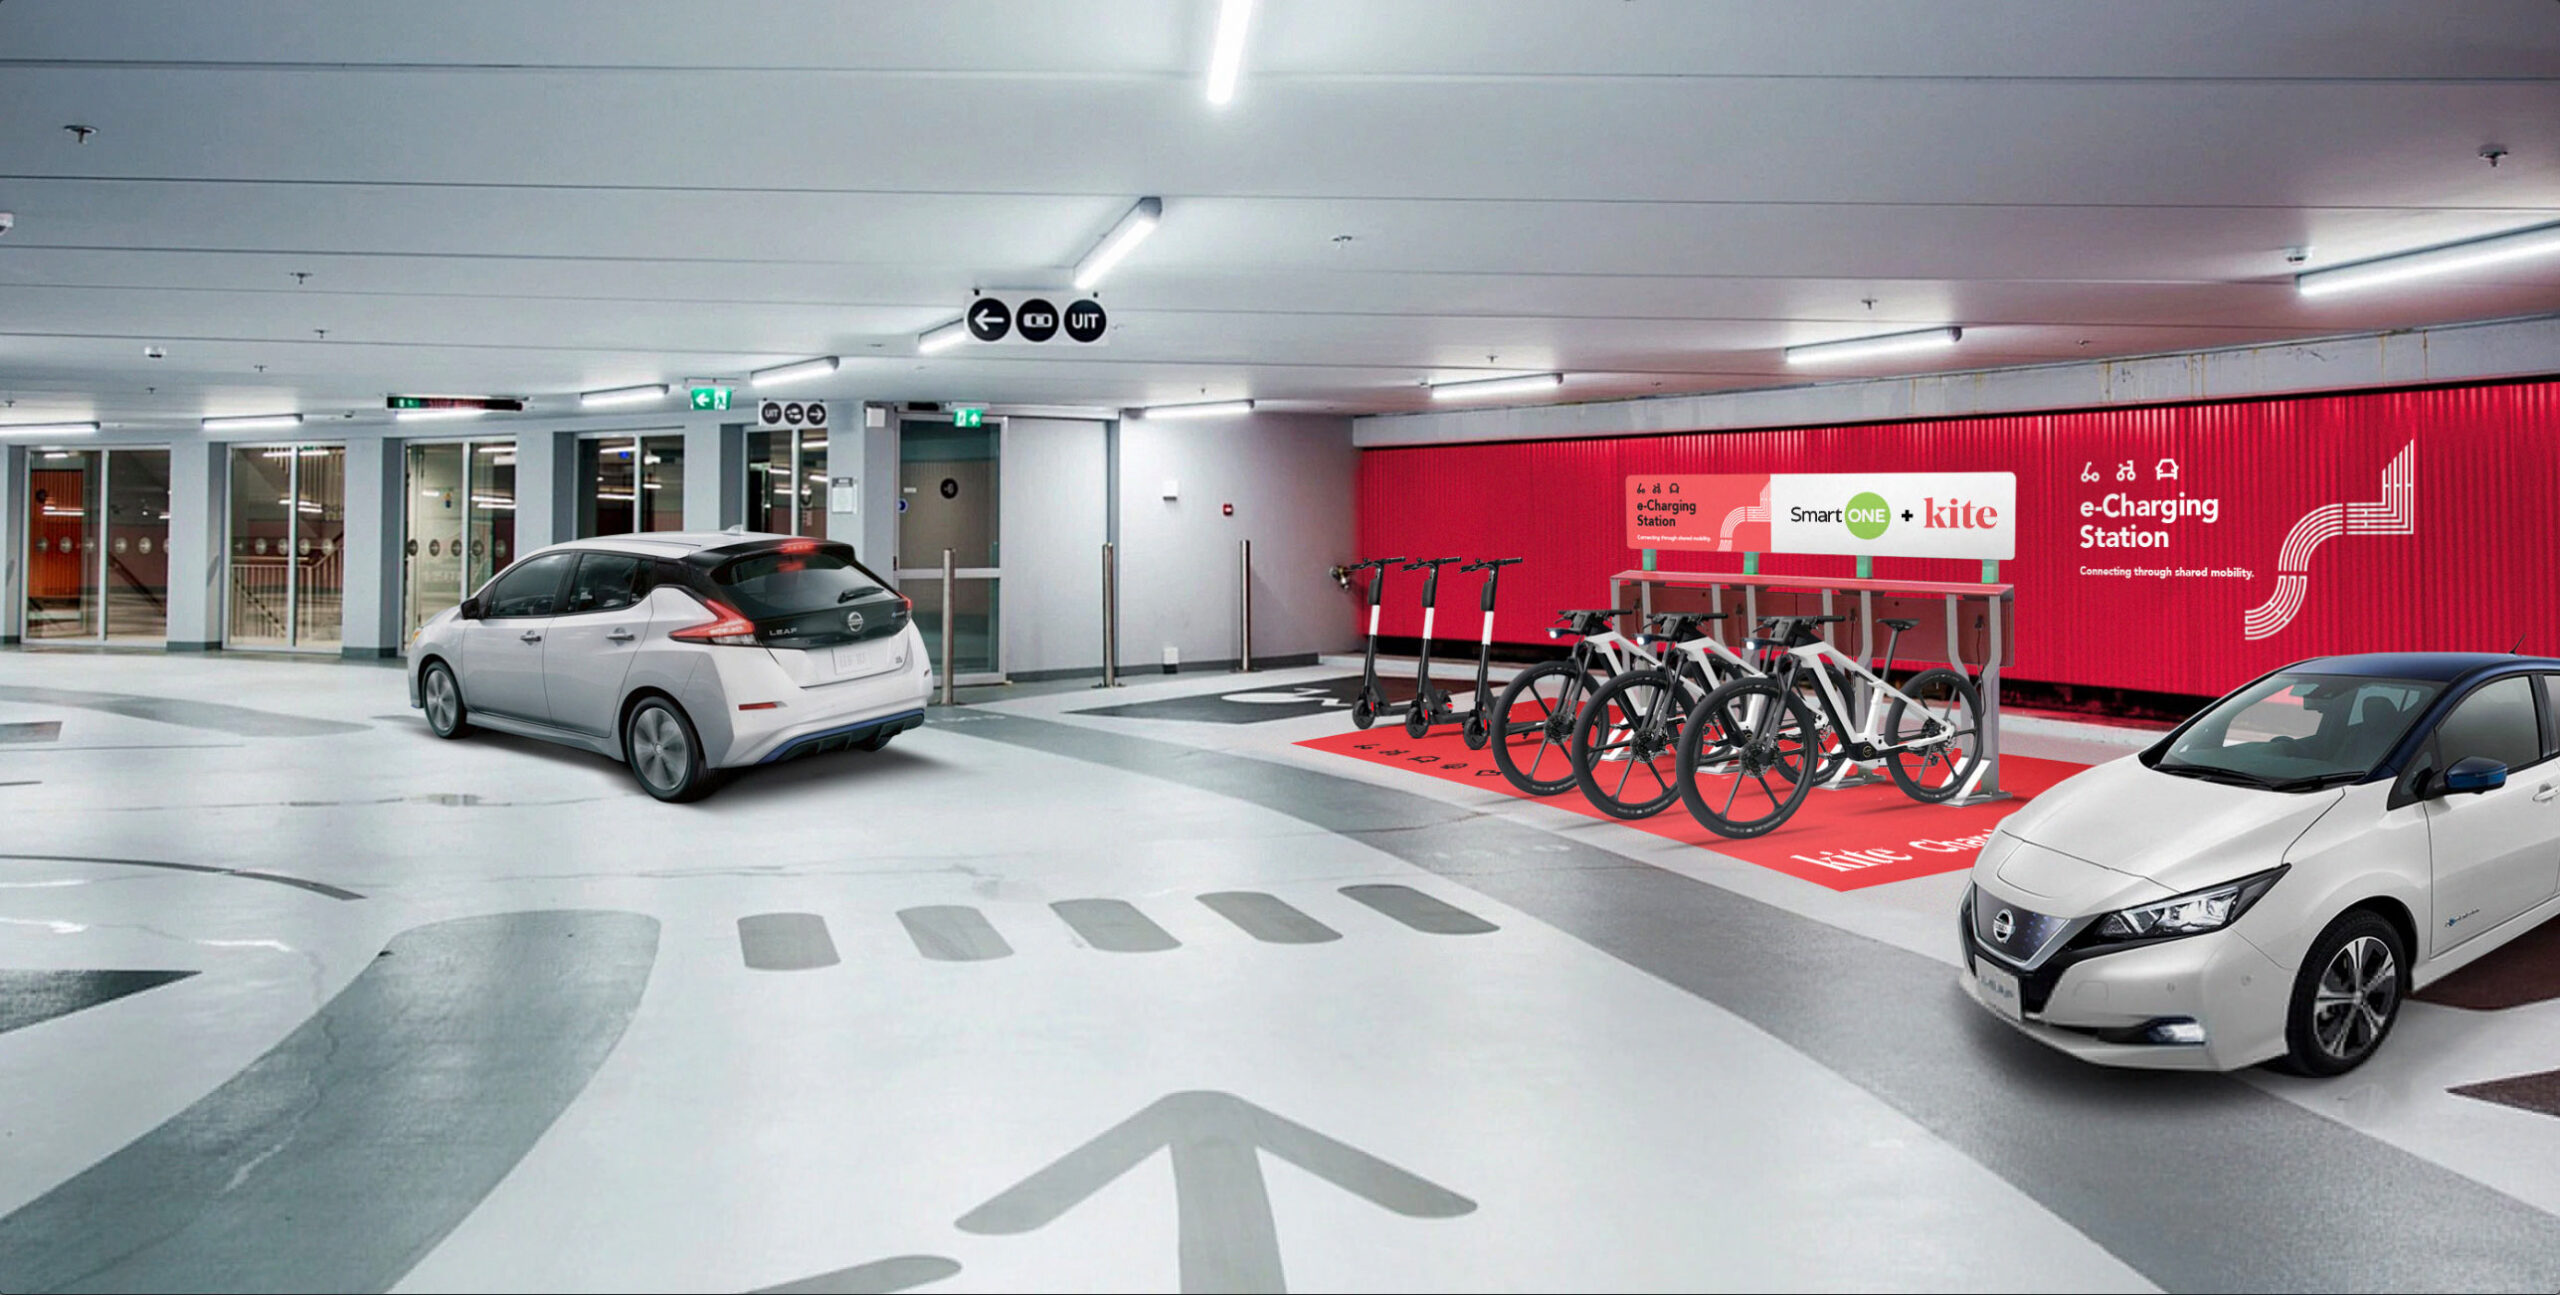 Parking garage Kite Mobility electric vehicle station